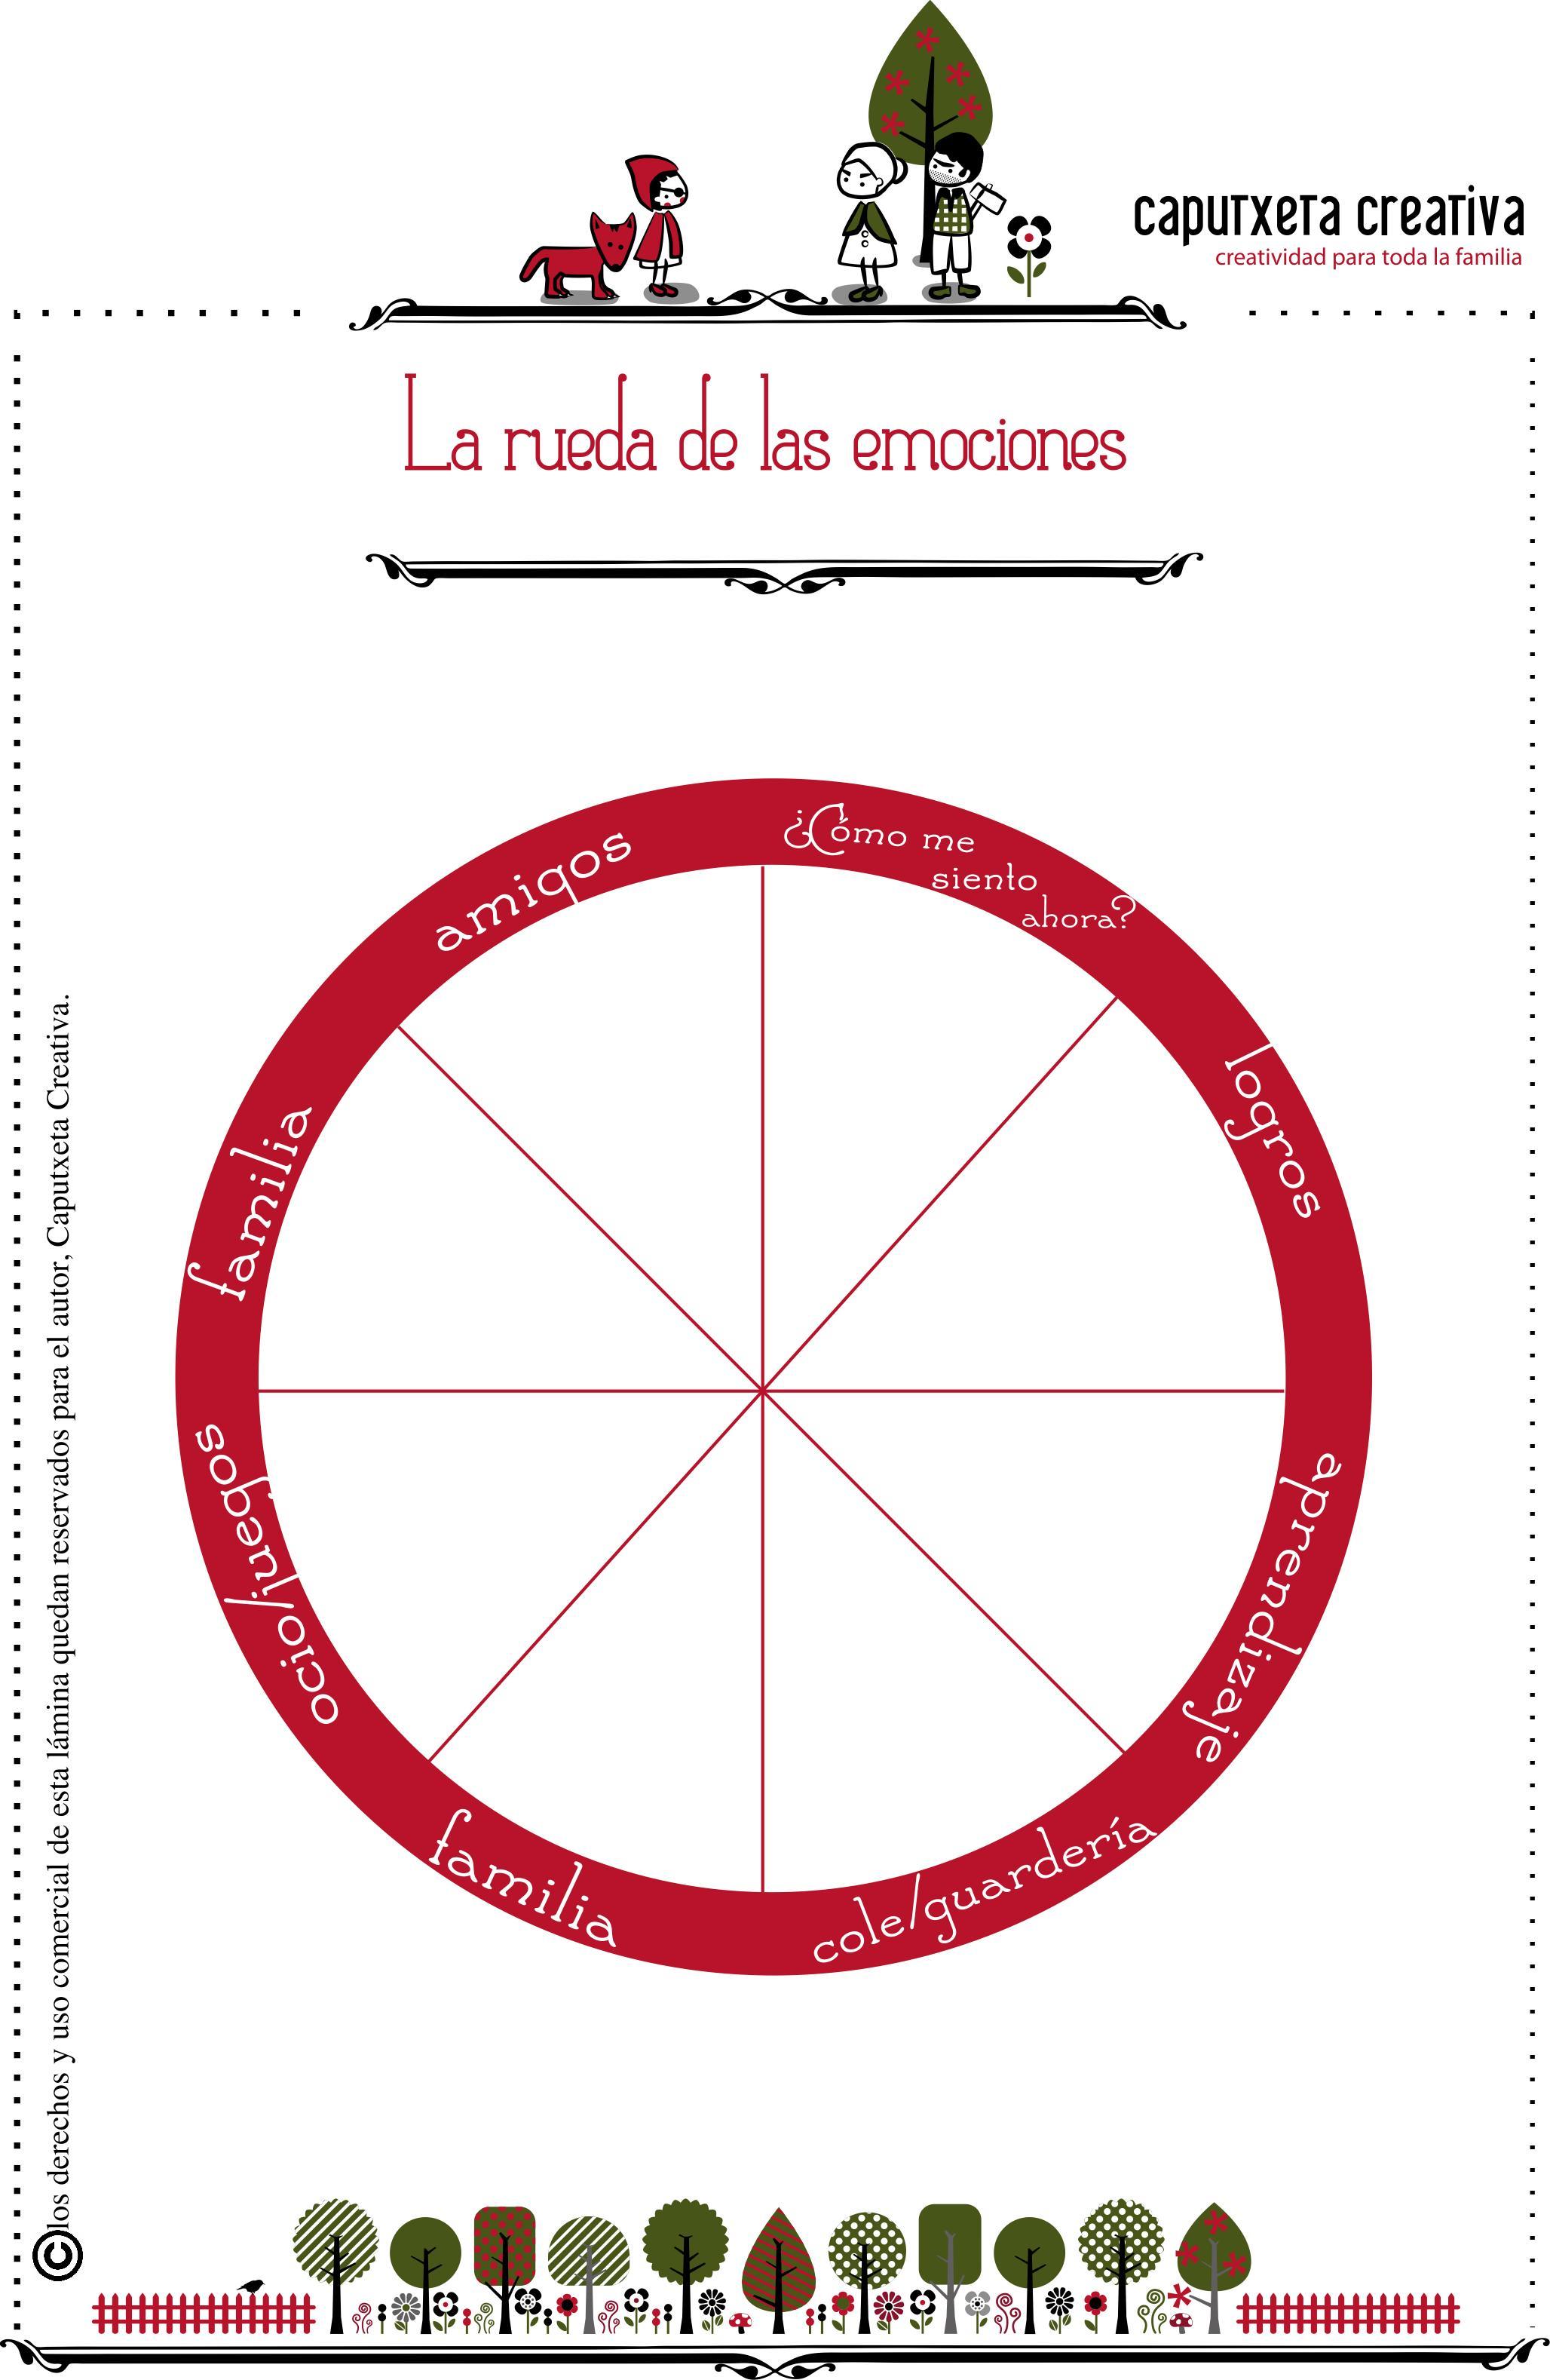 caputxeta creativa | comunicar bien para educar mejor | Page 15